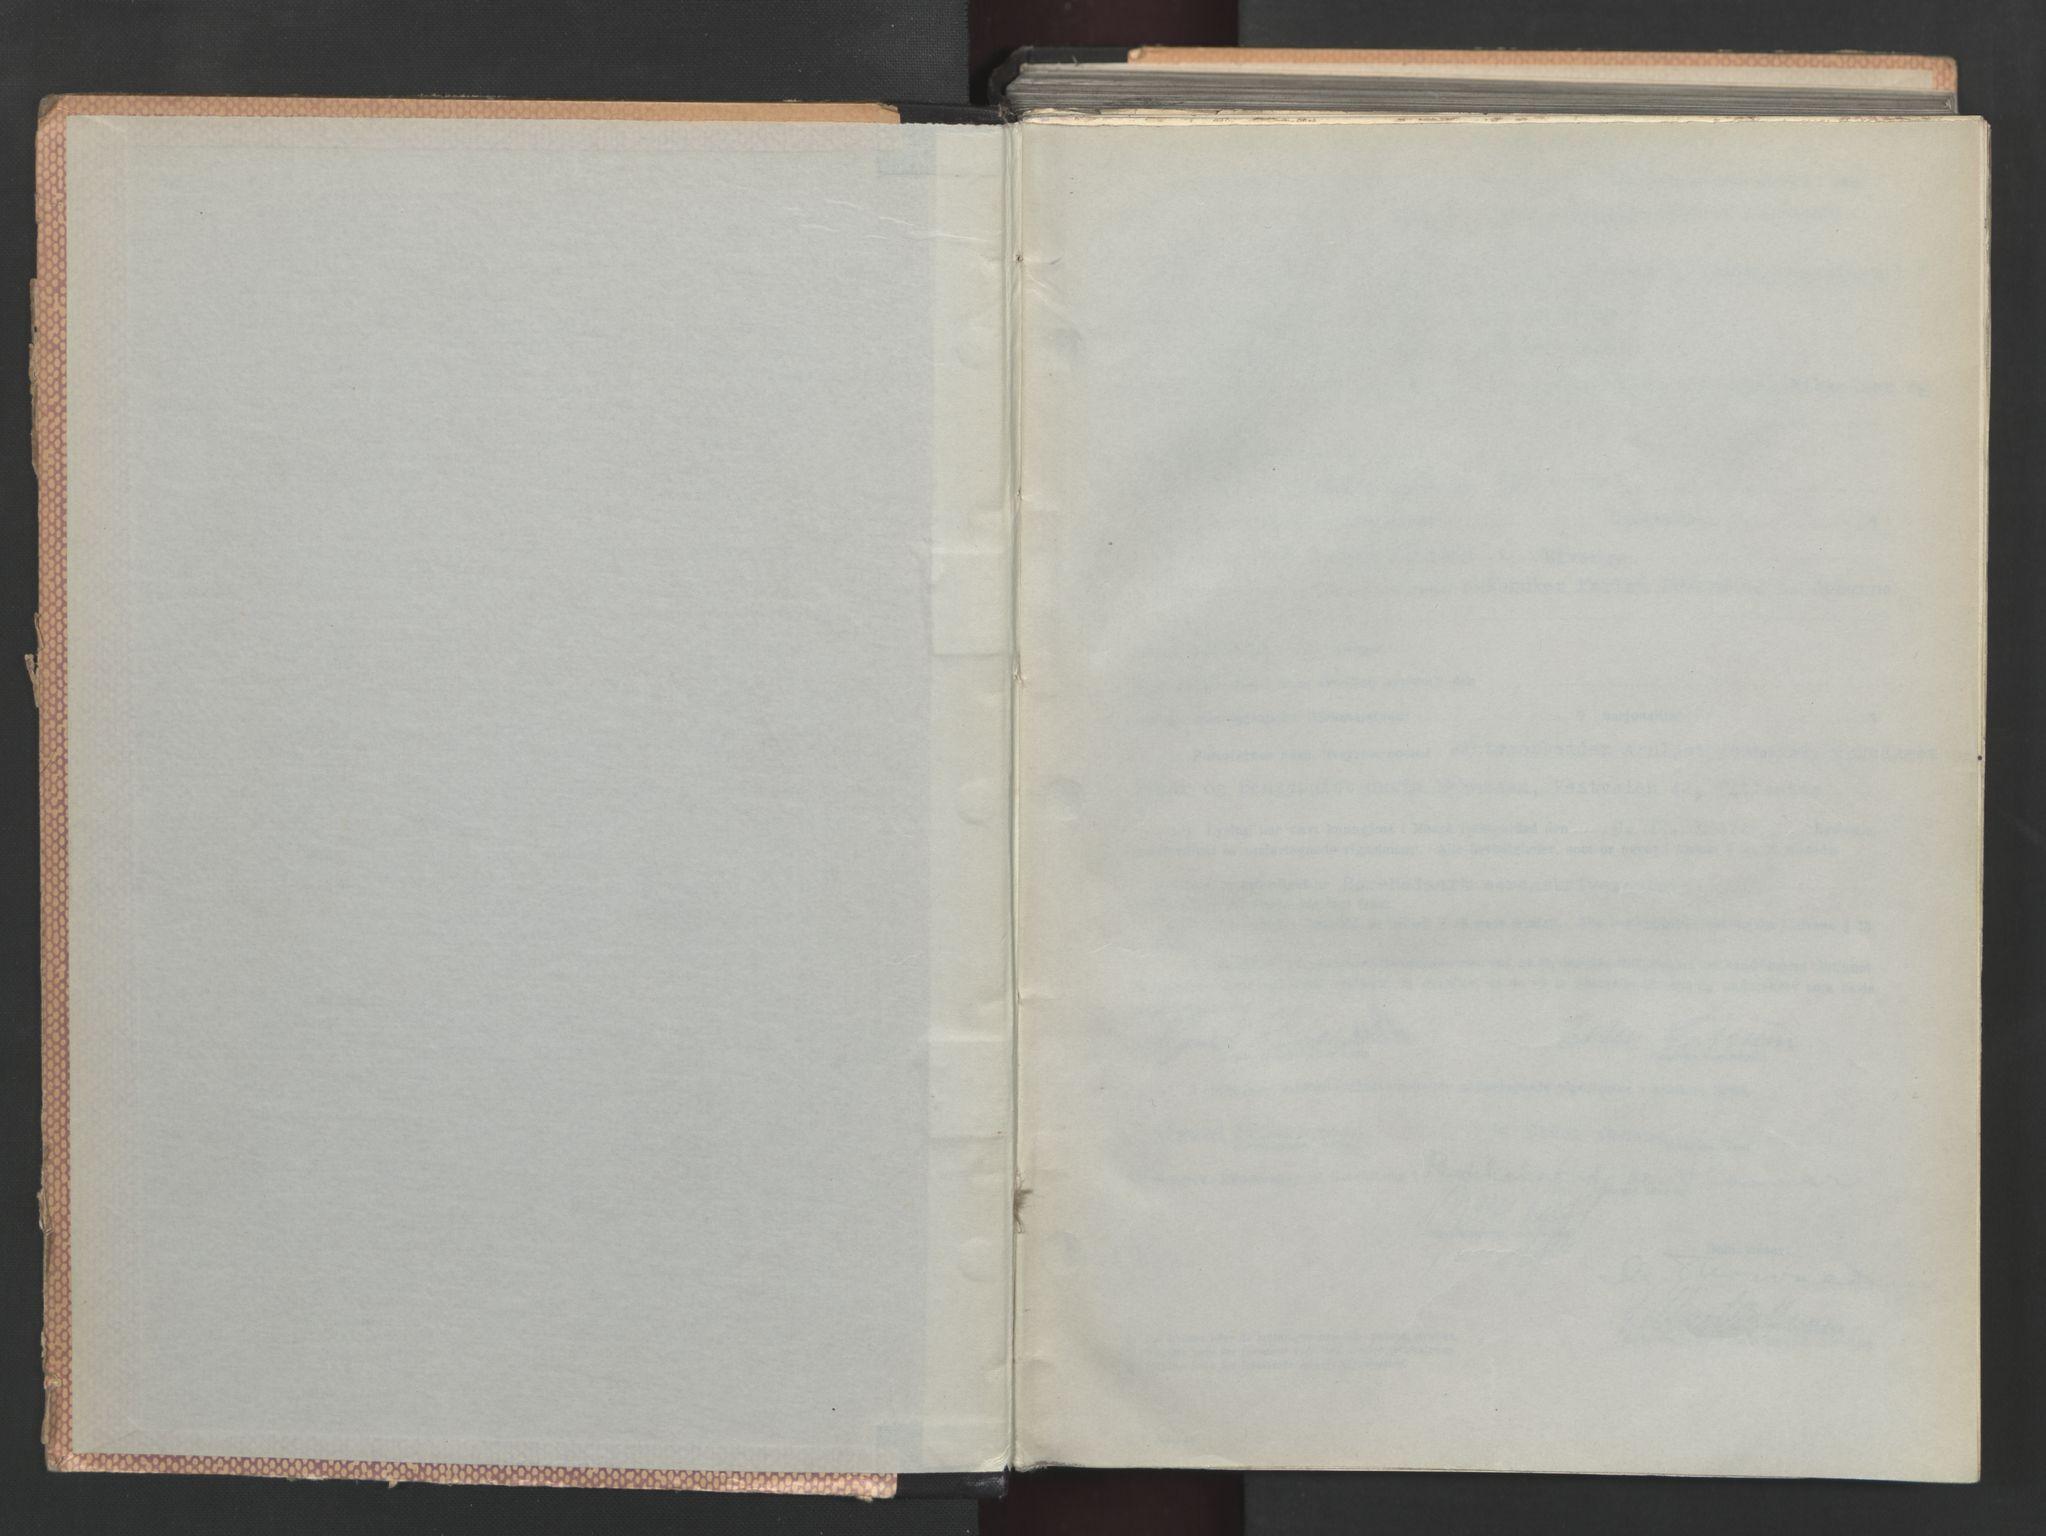 SAO, Aker sorenskriveri, L/Lc/Lcb/L0021: Vigselprotokoll, 1944, s. upaginert